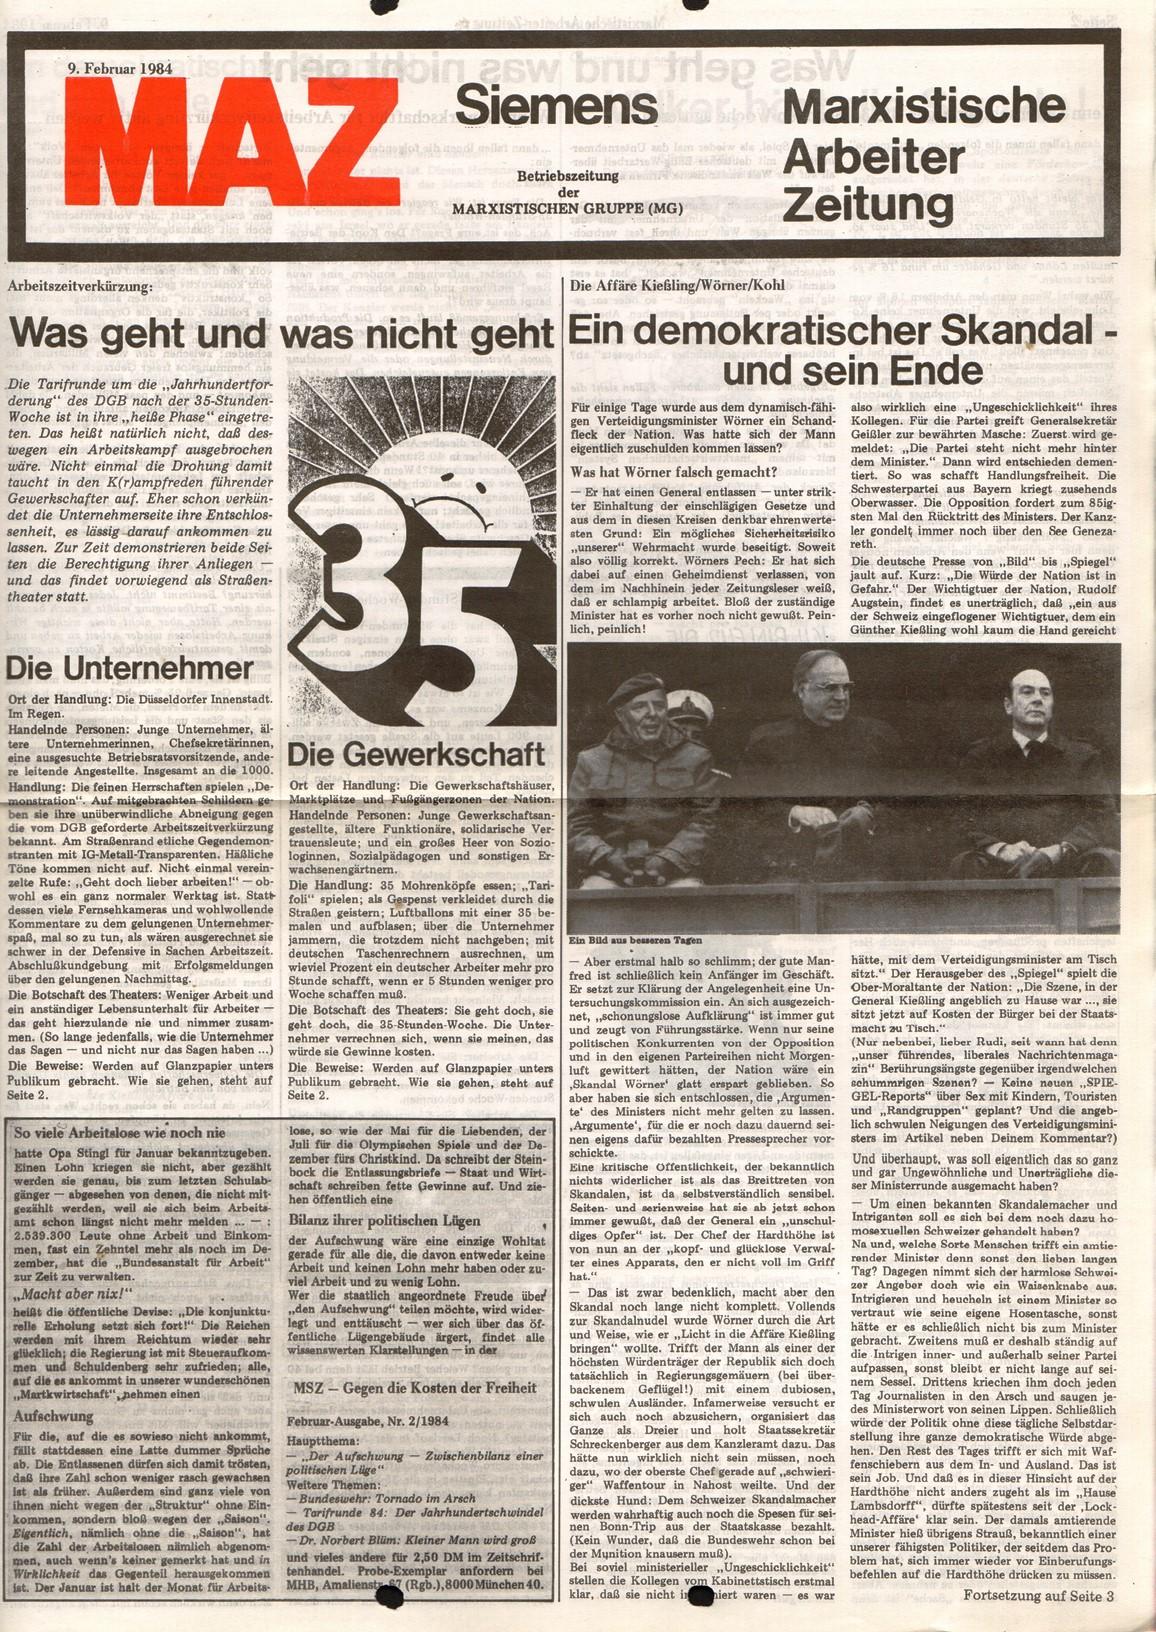 Muenchen_MG_MAZ_Siemens_19840209_01